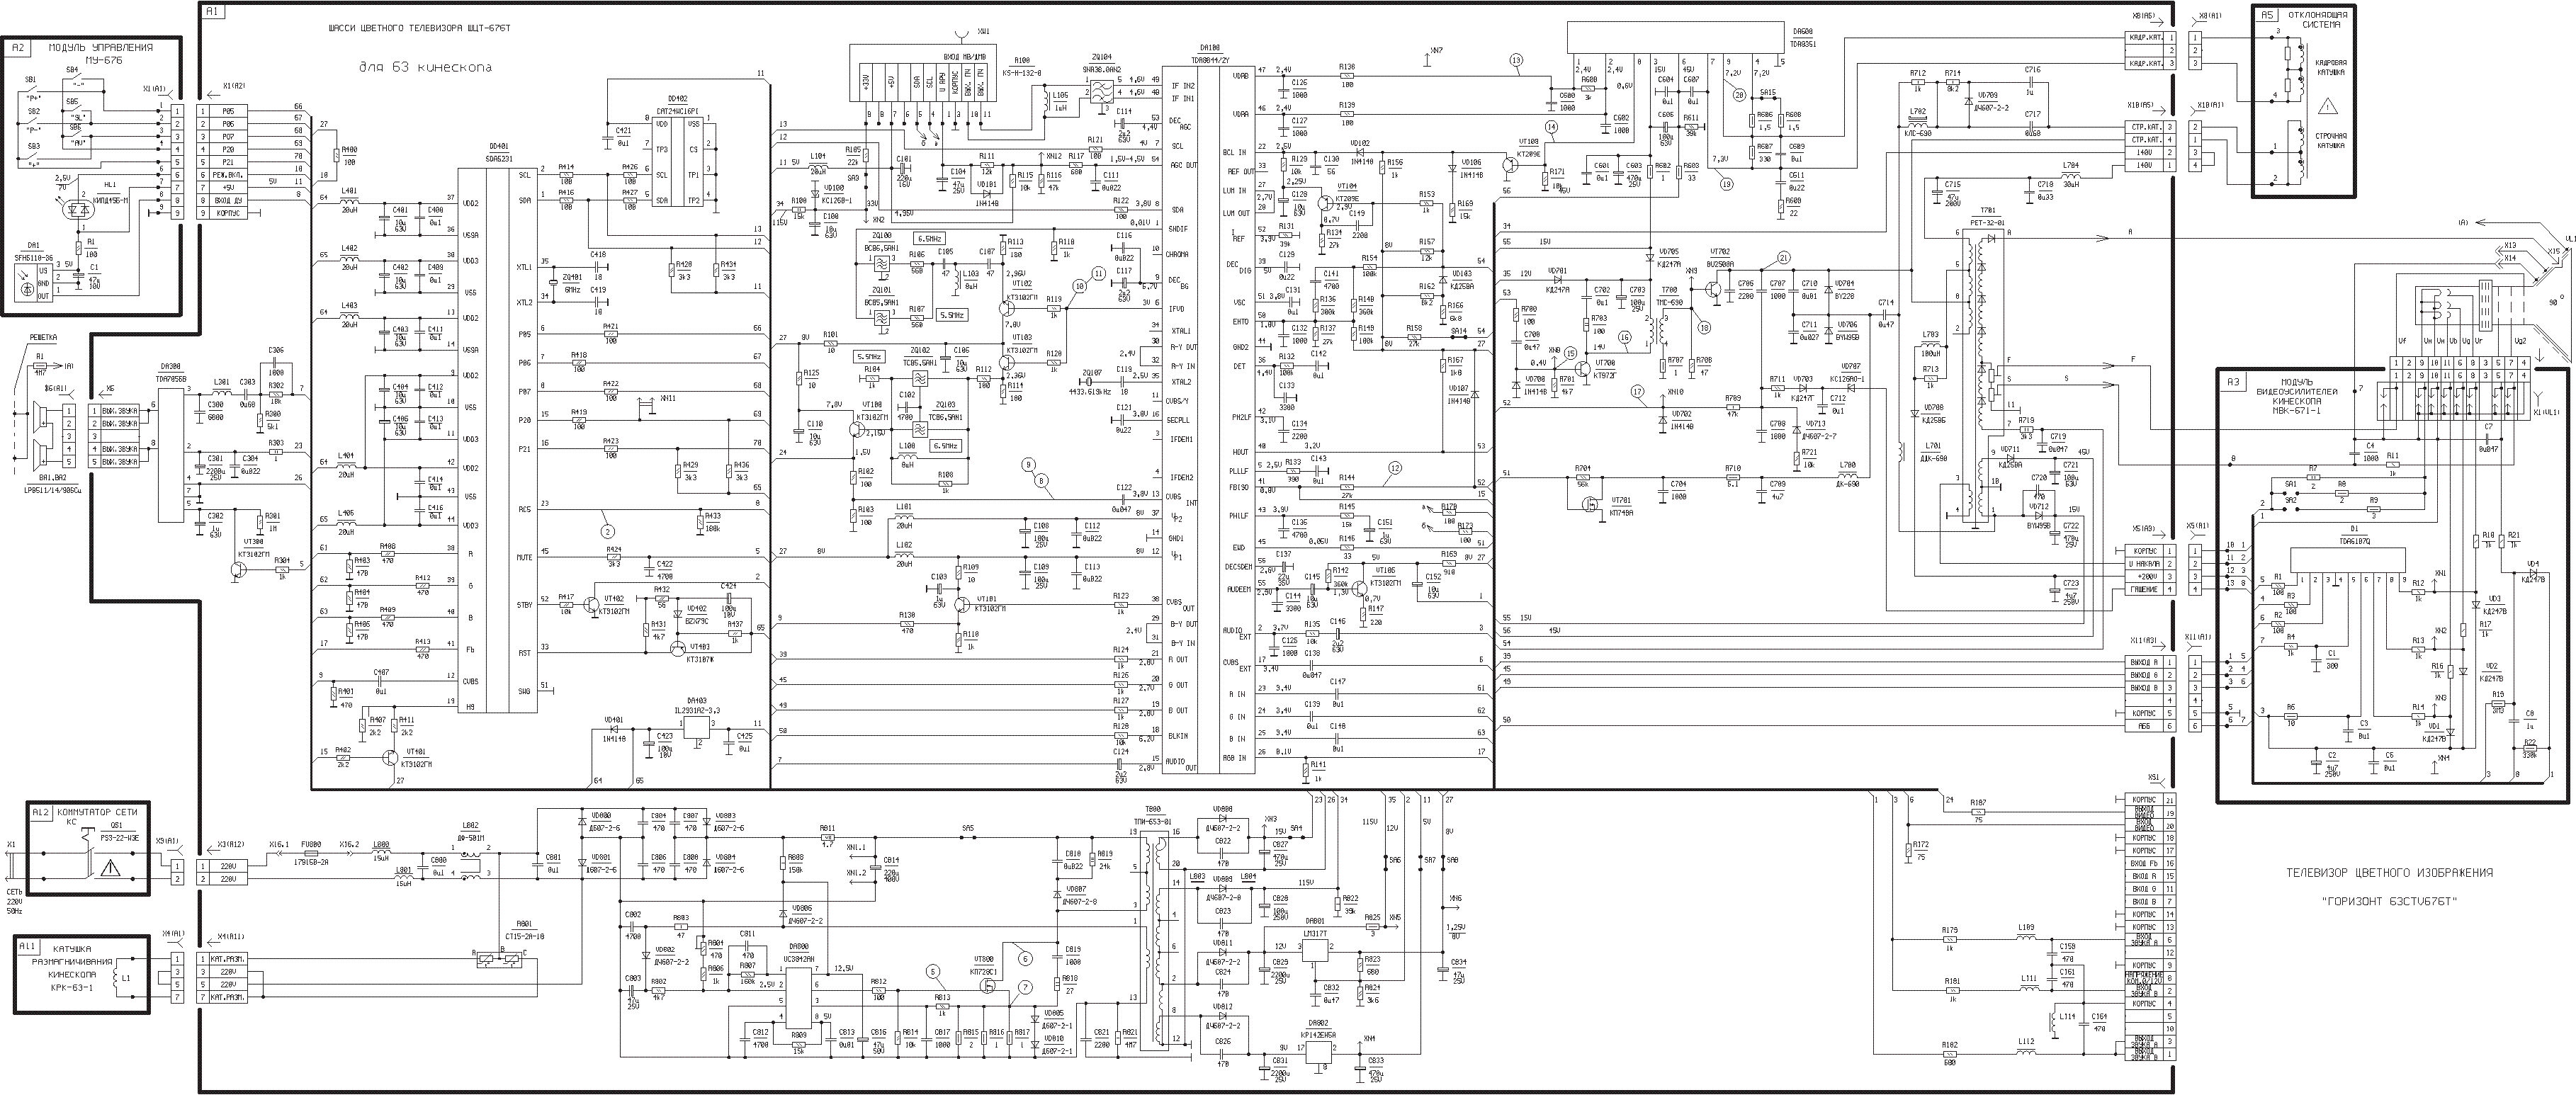 схема телевизора ujhbpjyn 63 cnd 676 1